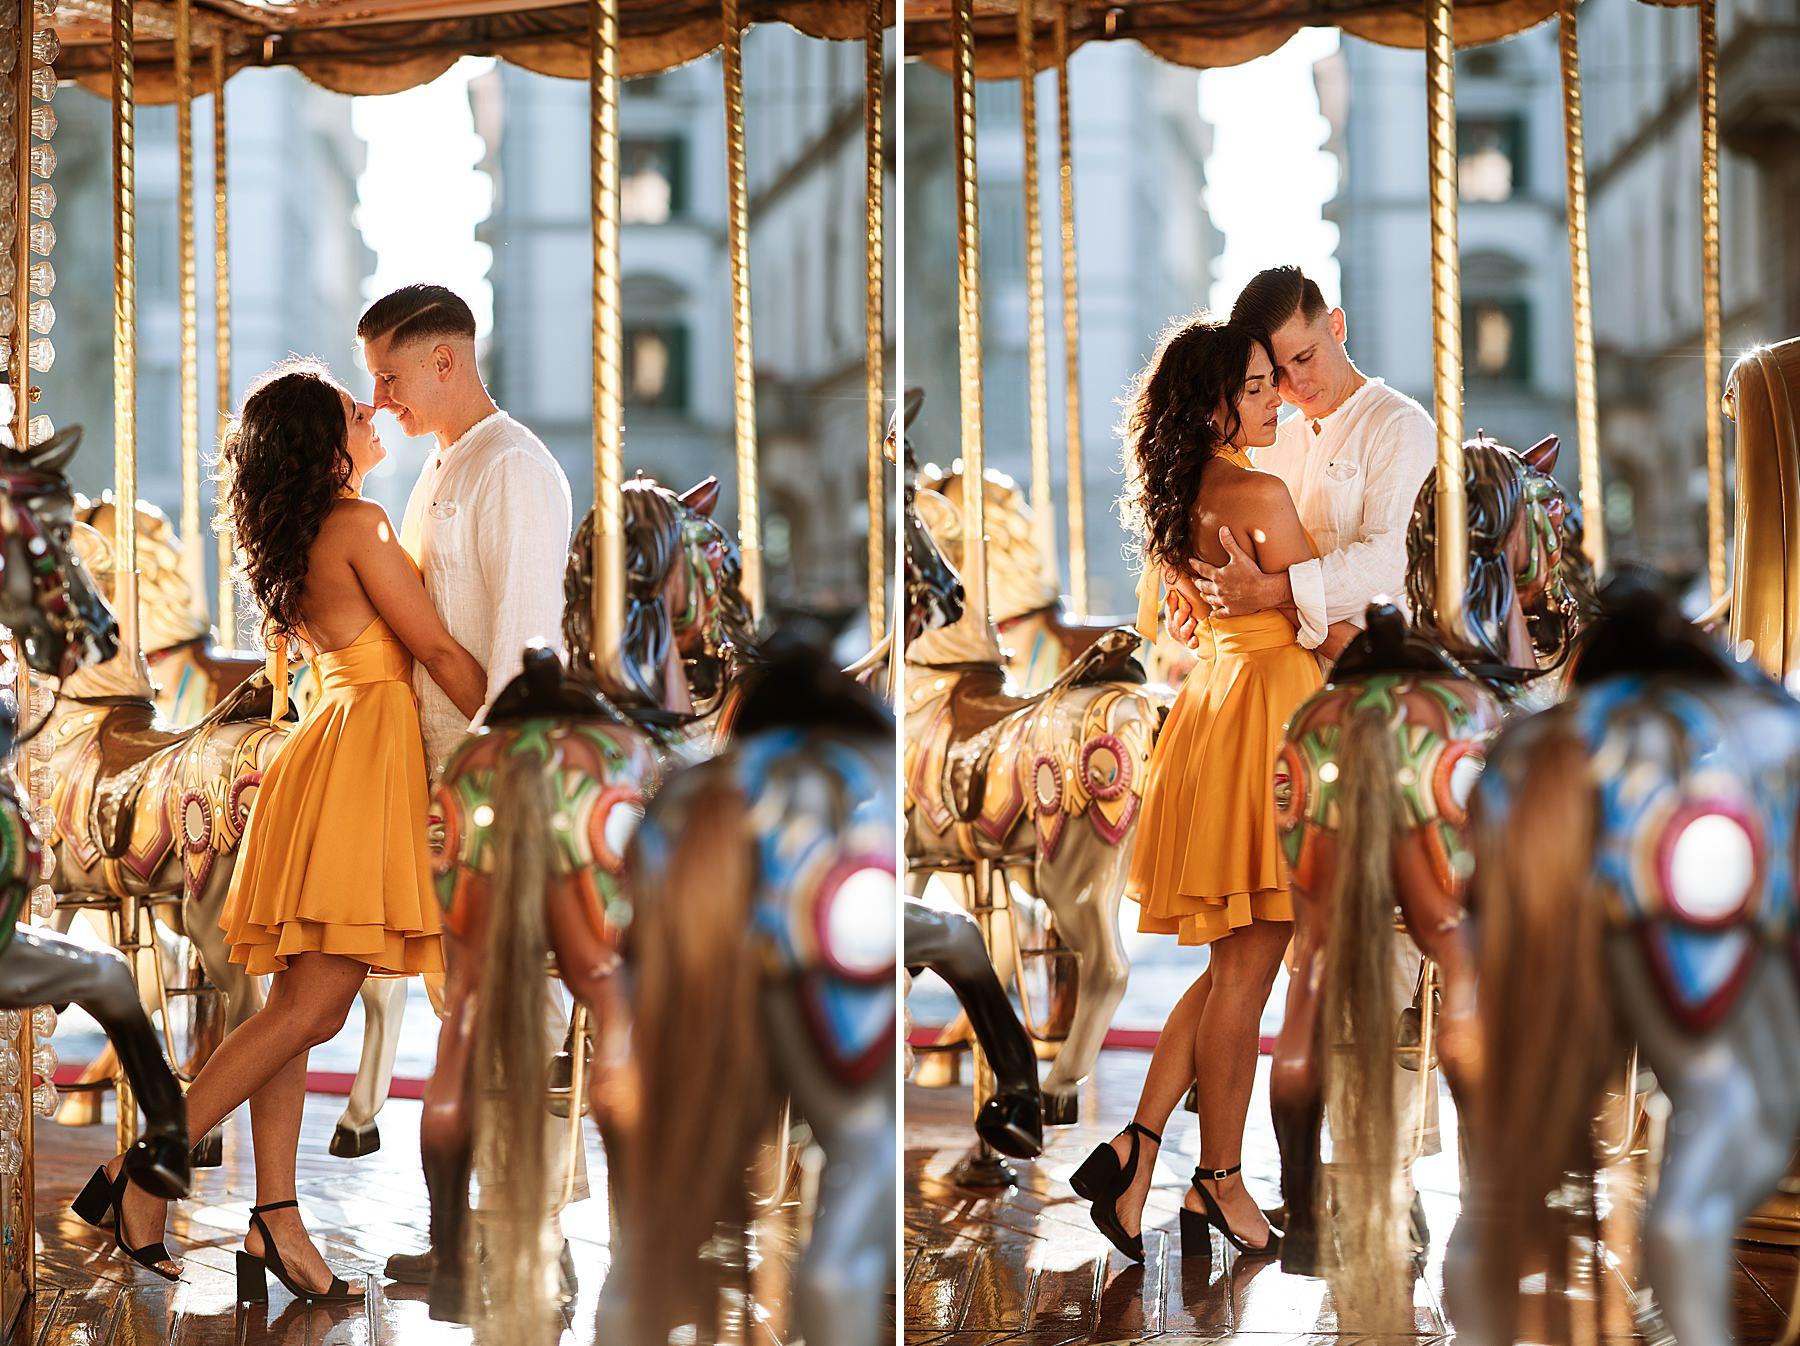 foto di coppia firenze giostra piazza repubblica